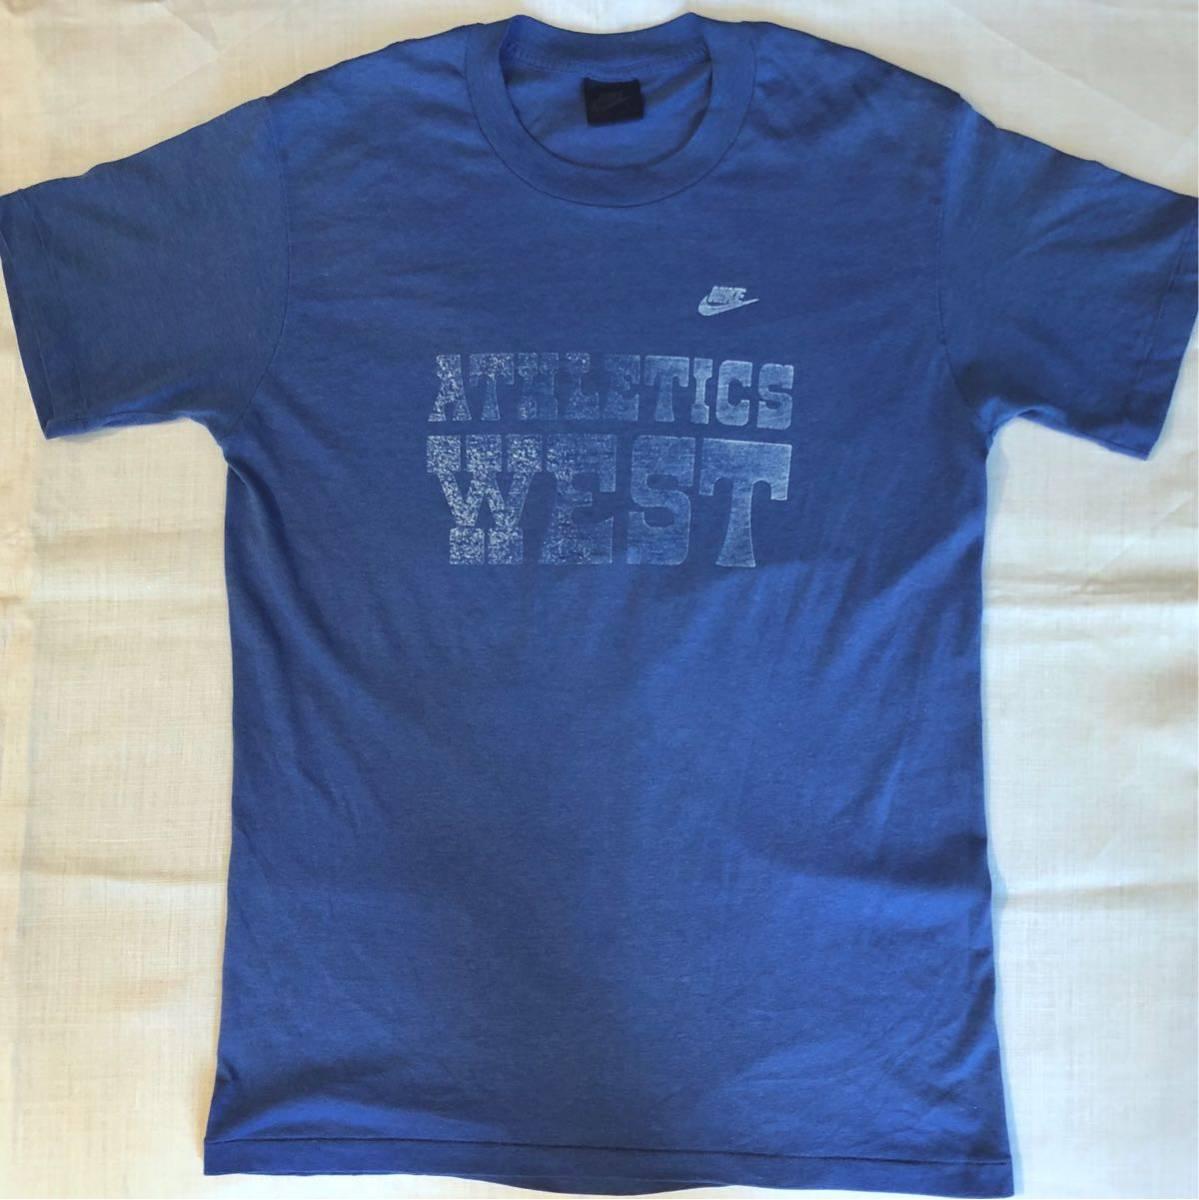 80s NIKE ATHLETICS WEST Print T-shirtナイキ プリント Tシャツ古着 古着女子 Lサイズ USA製